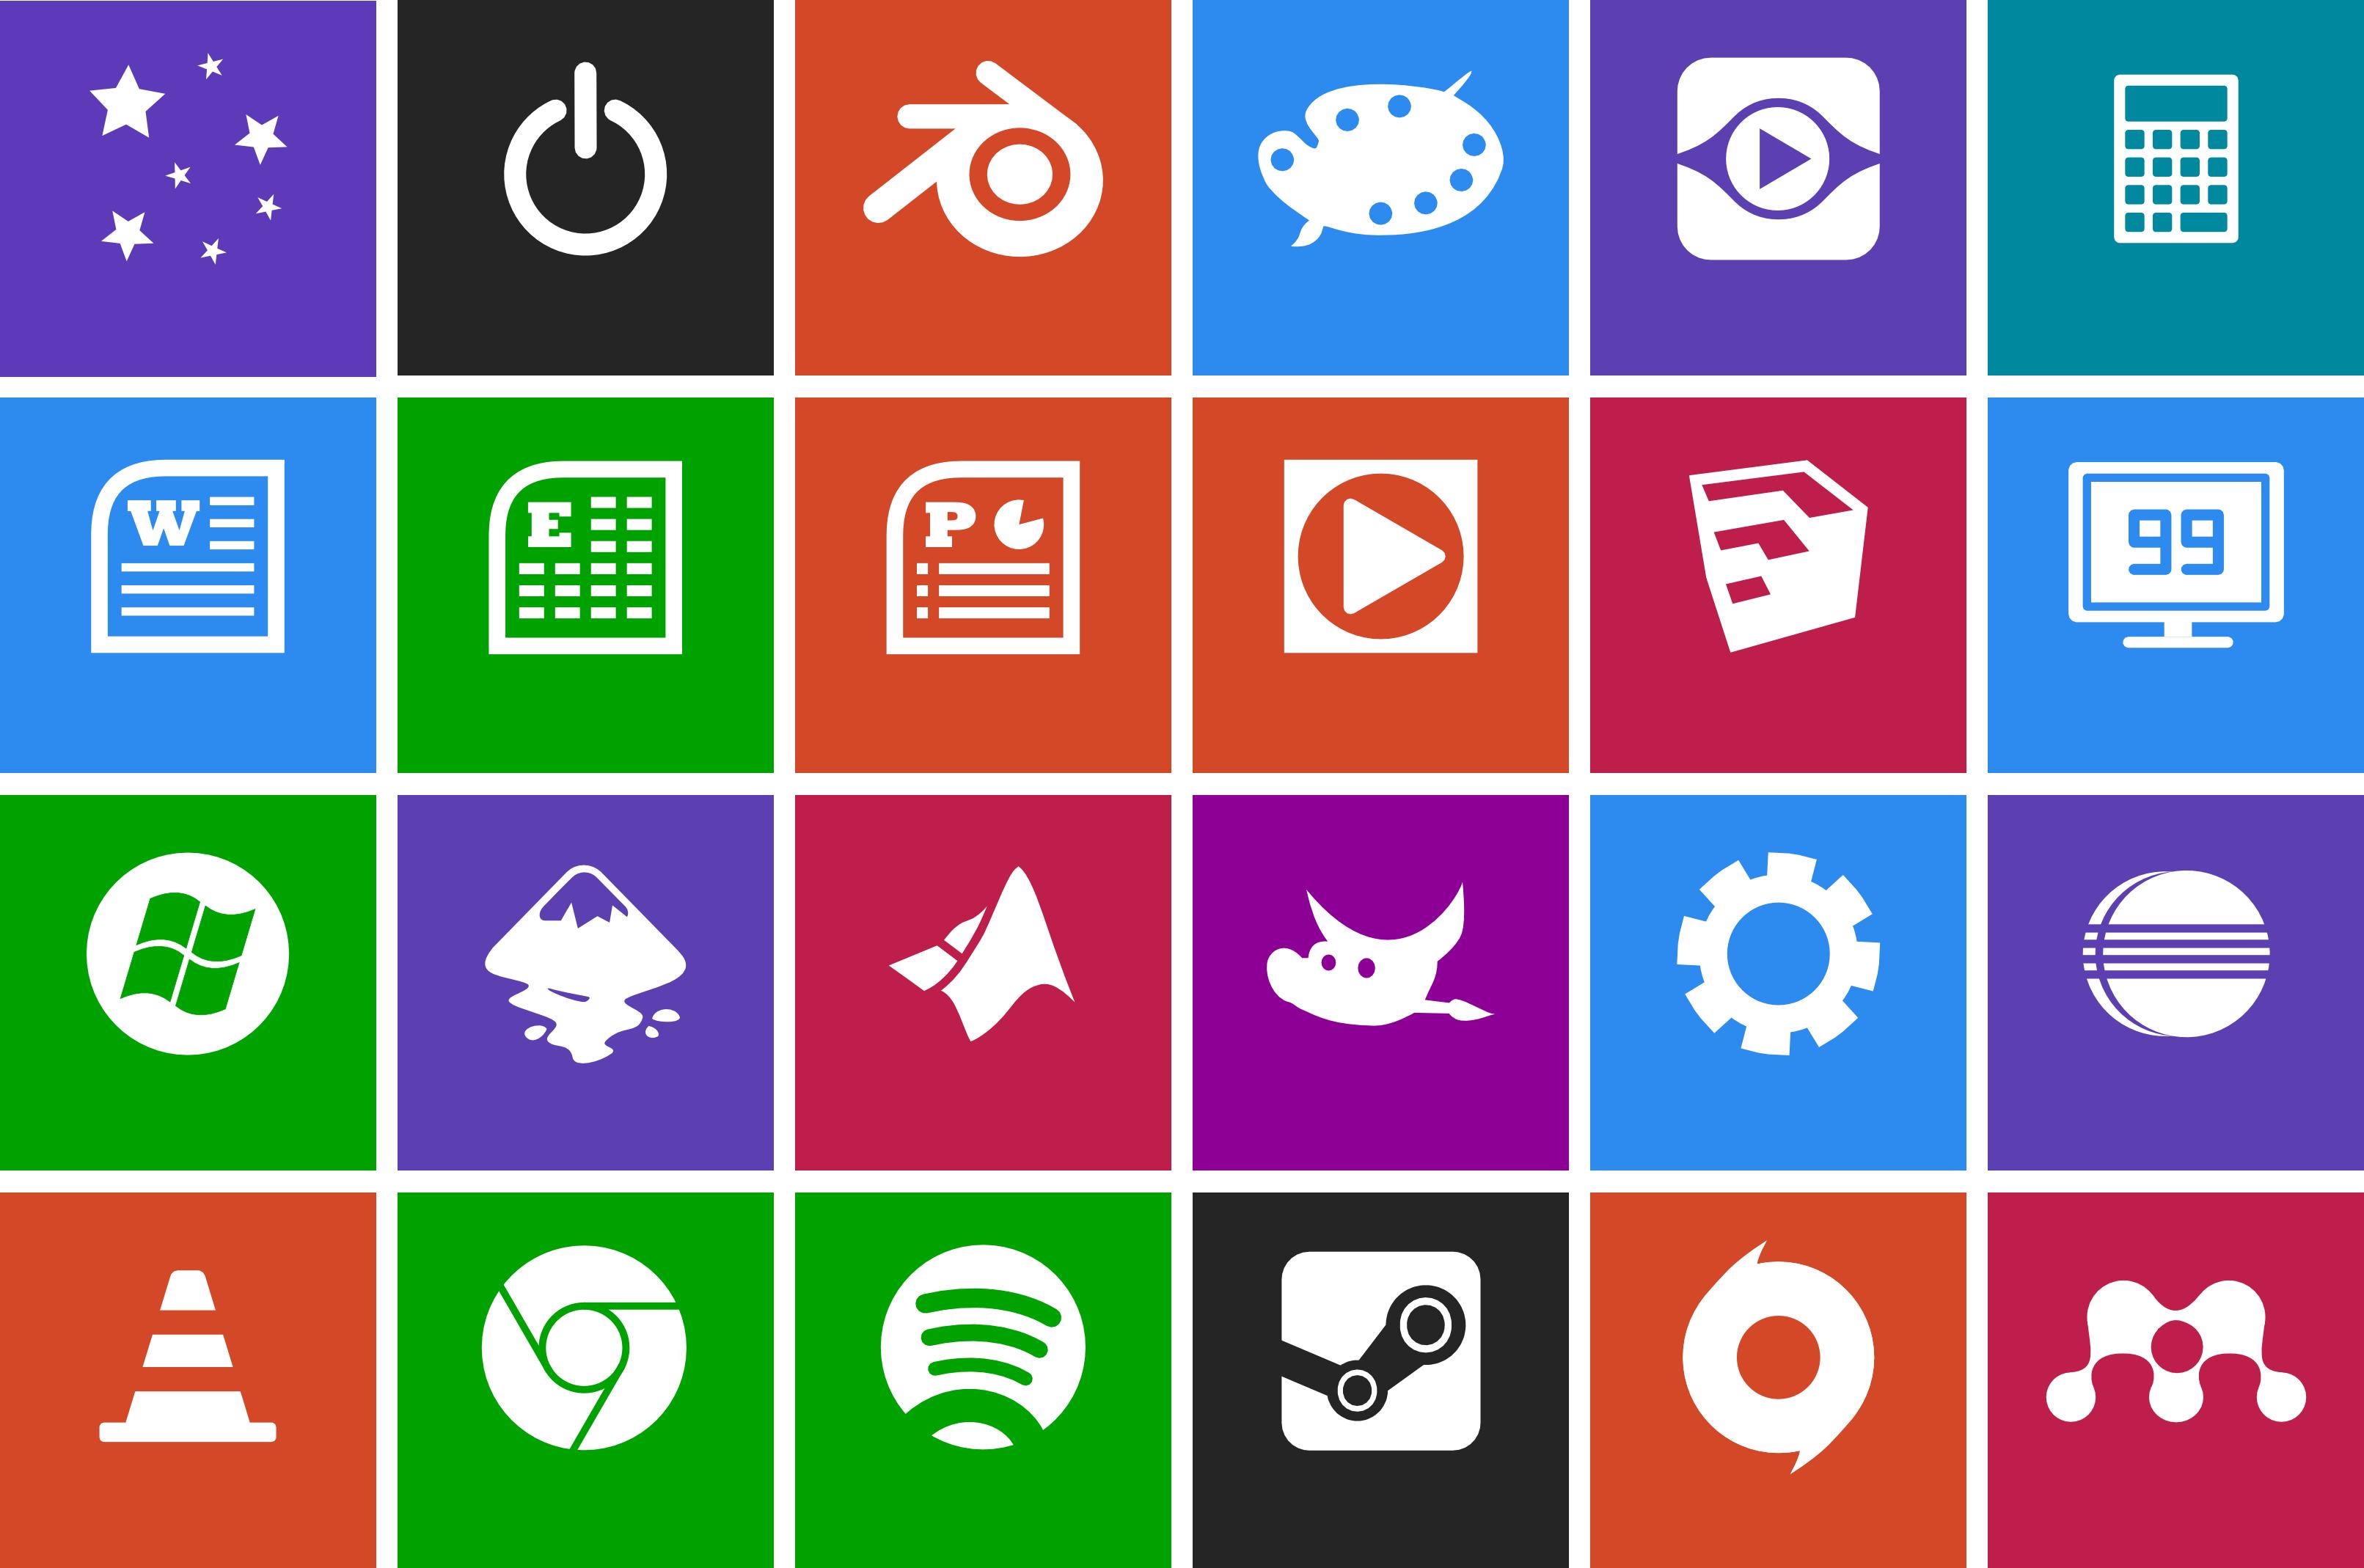 12 Windows Metro Style Icons Images